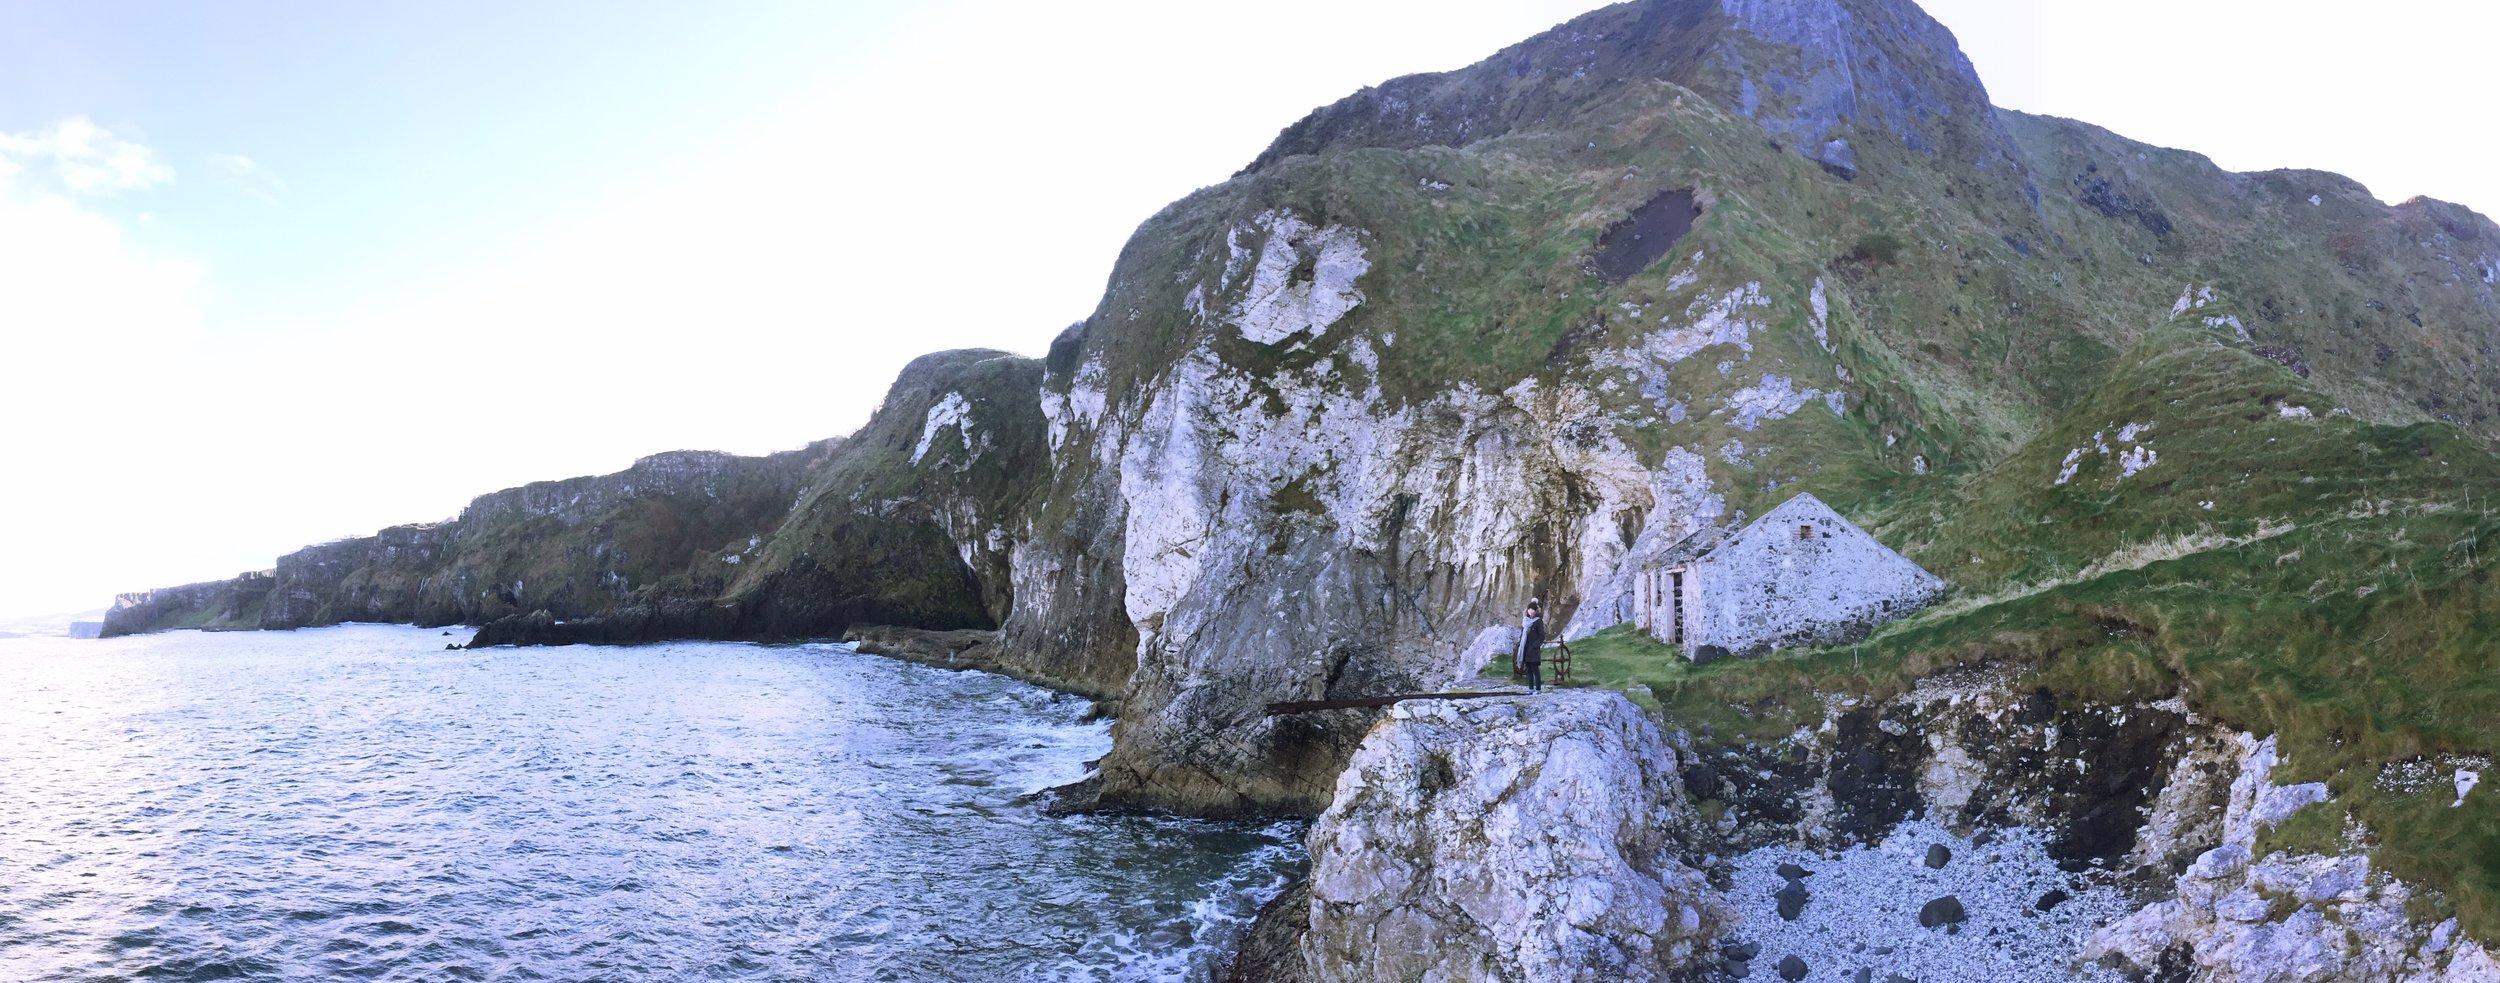 kinbane_head_castle_ni_explorer_northern_ireland (5)